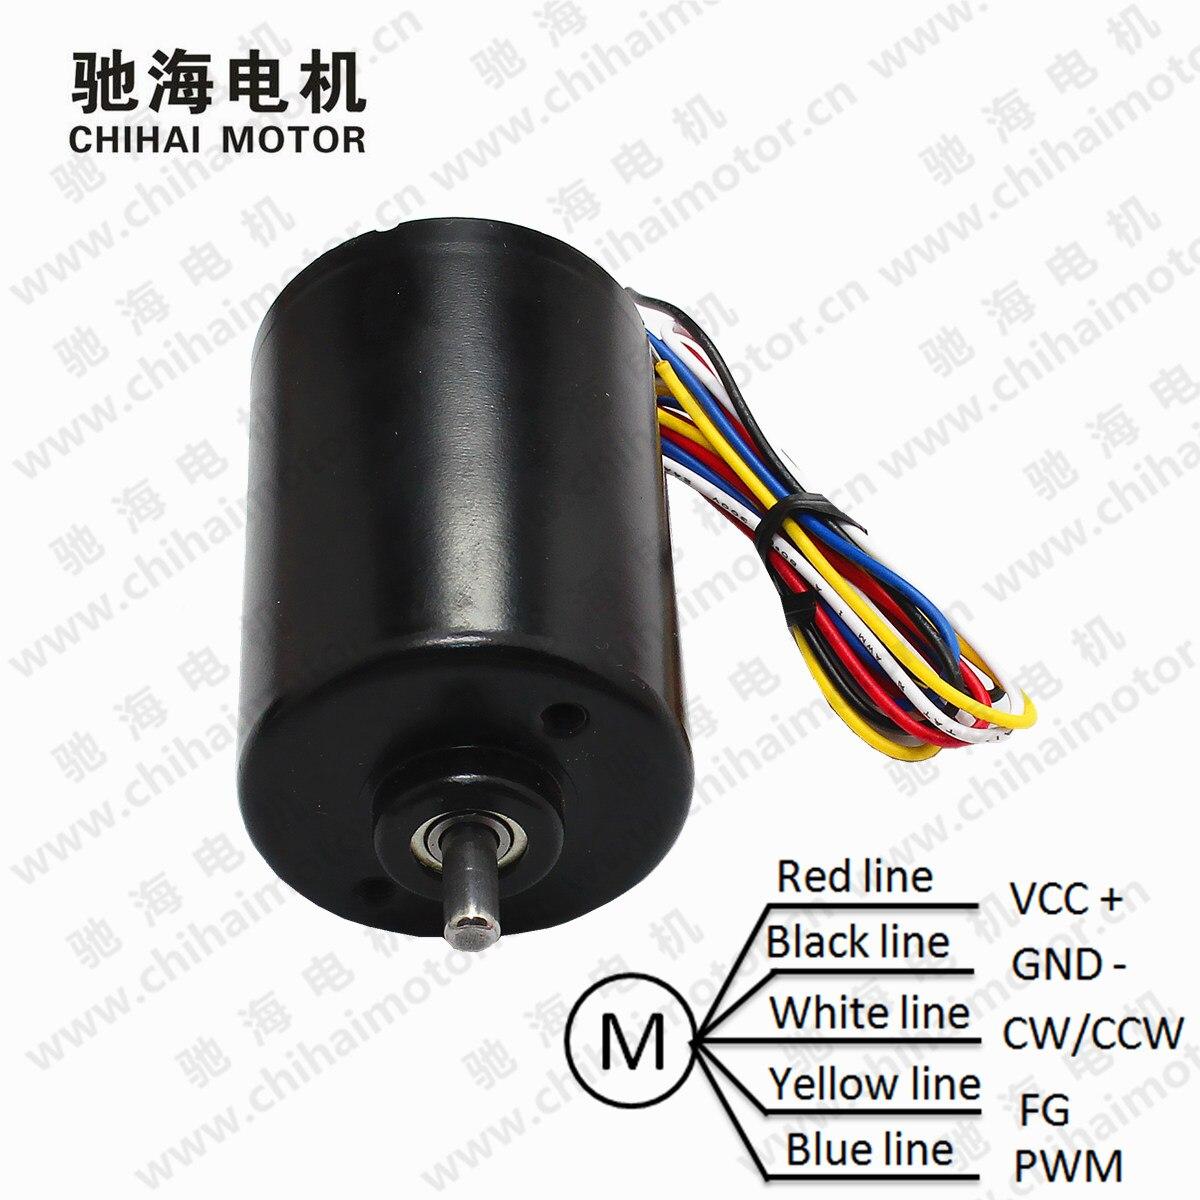 все цены на DC12V / 4000RPM 24V / 8000RPM BLDC4260 Brushless Permanent Magnet DC Motor Built - in Drive онлайн